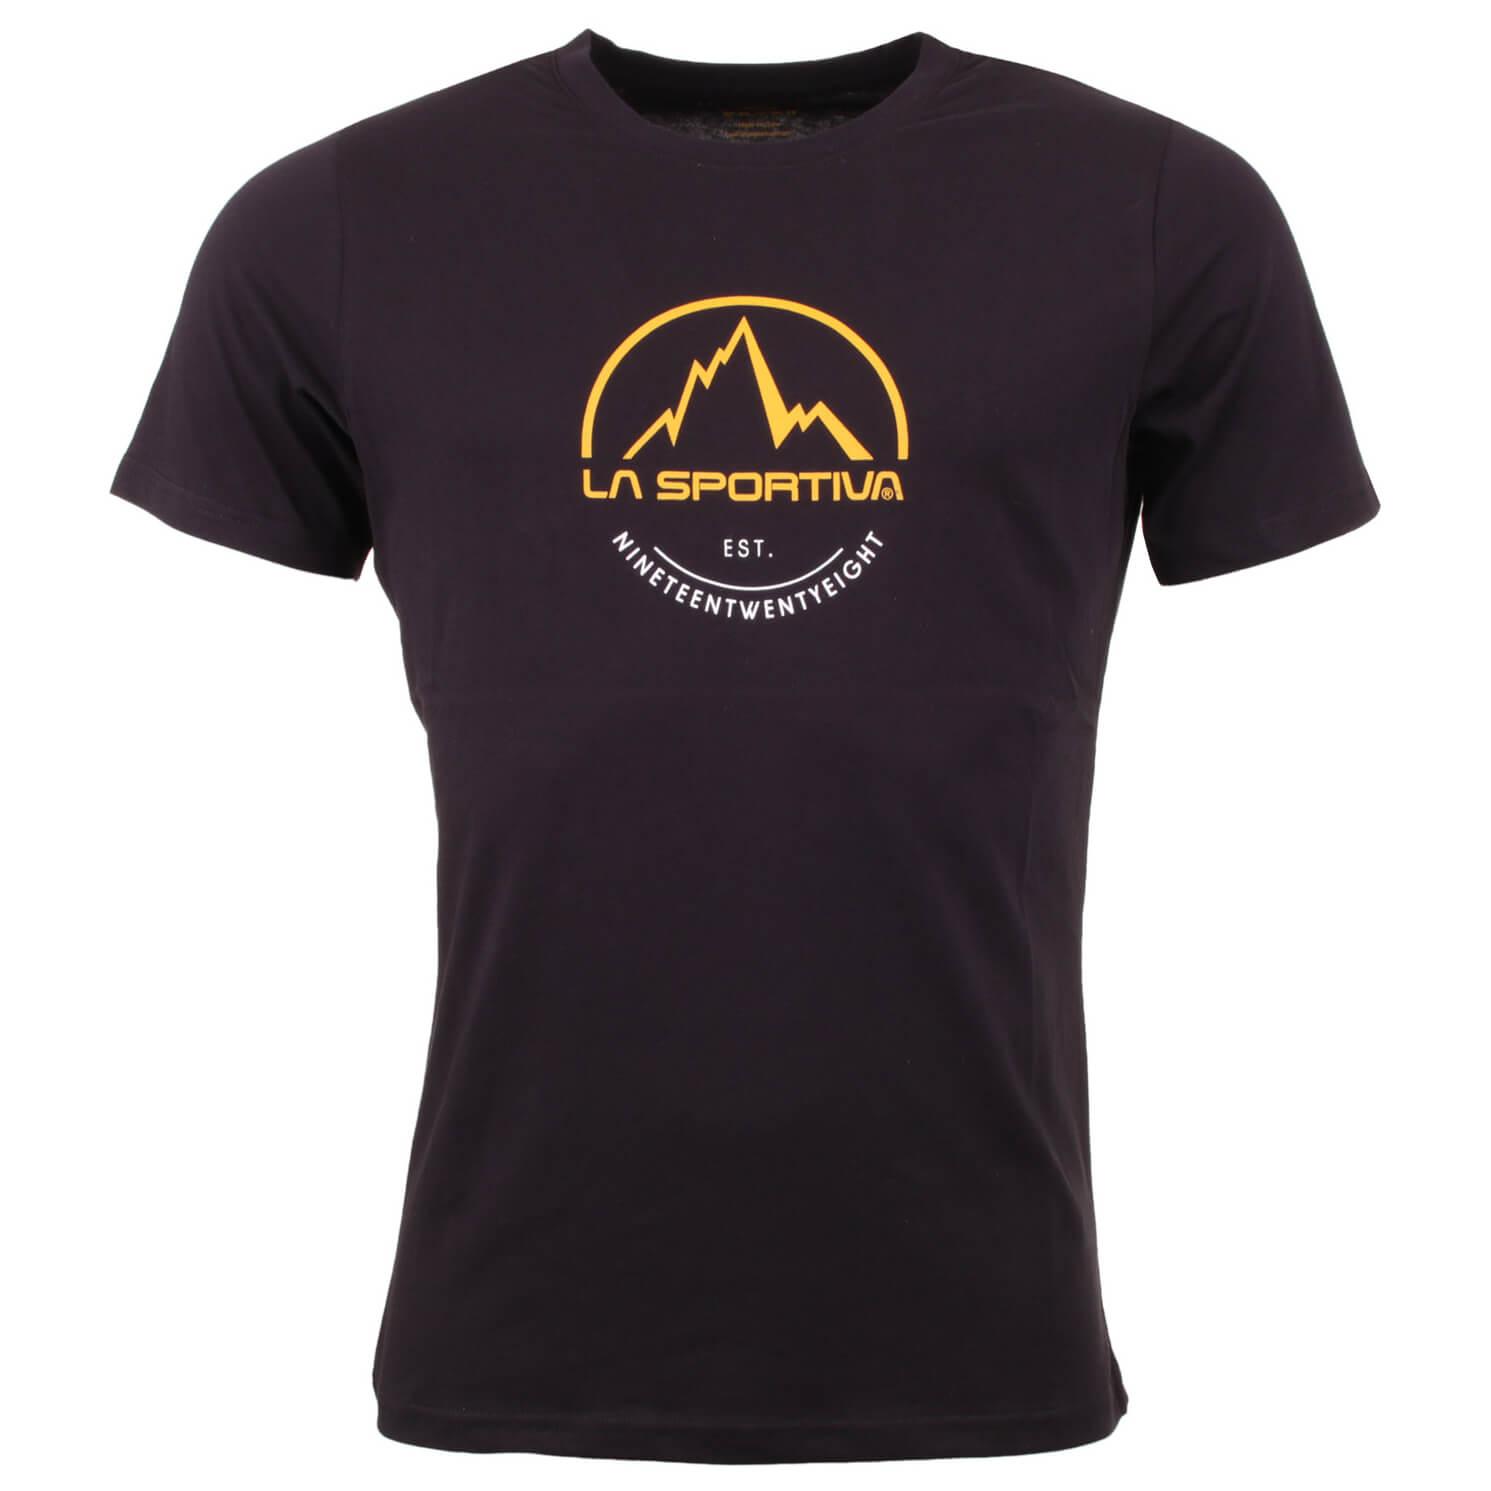 La sportiva logo tee t shirt herren online kaufen for Logo t shirts online